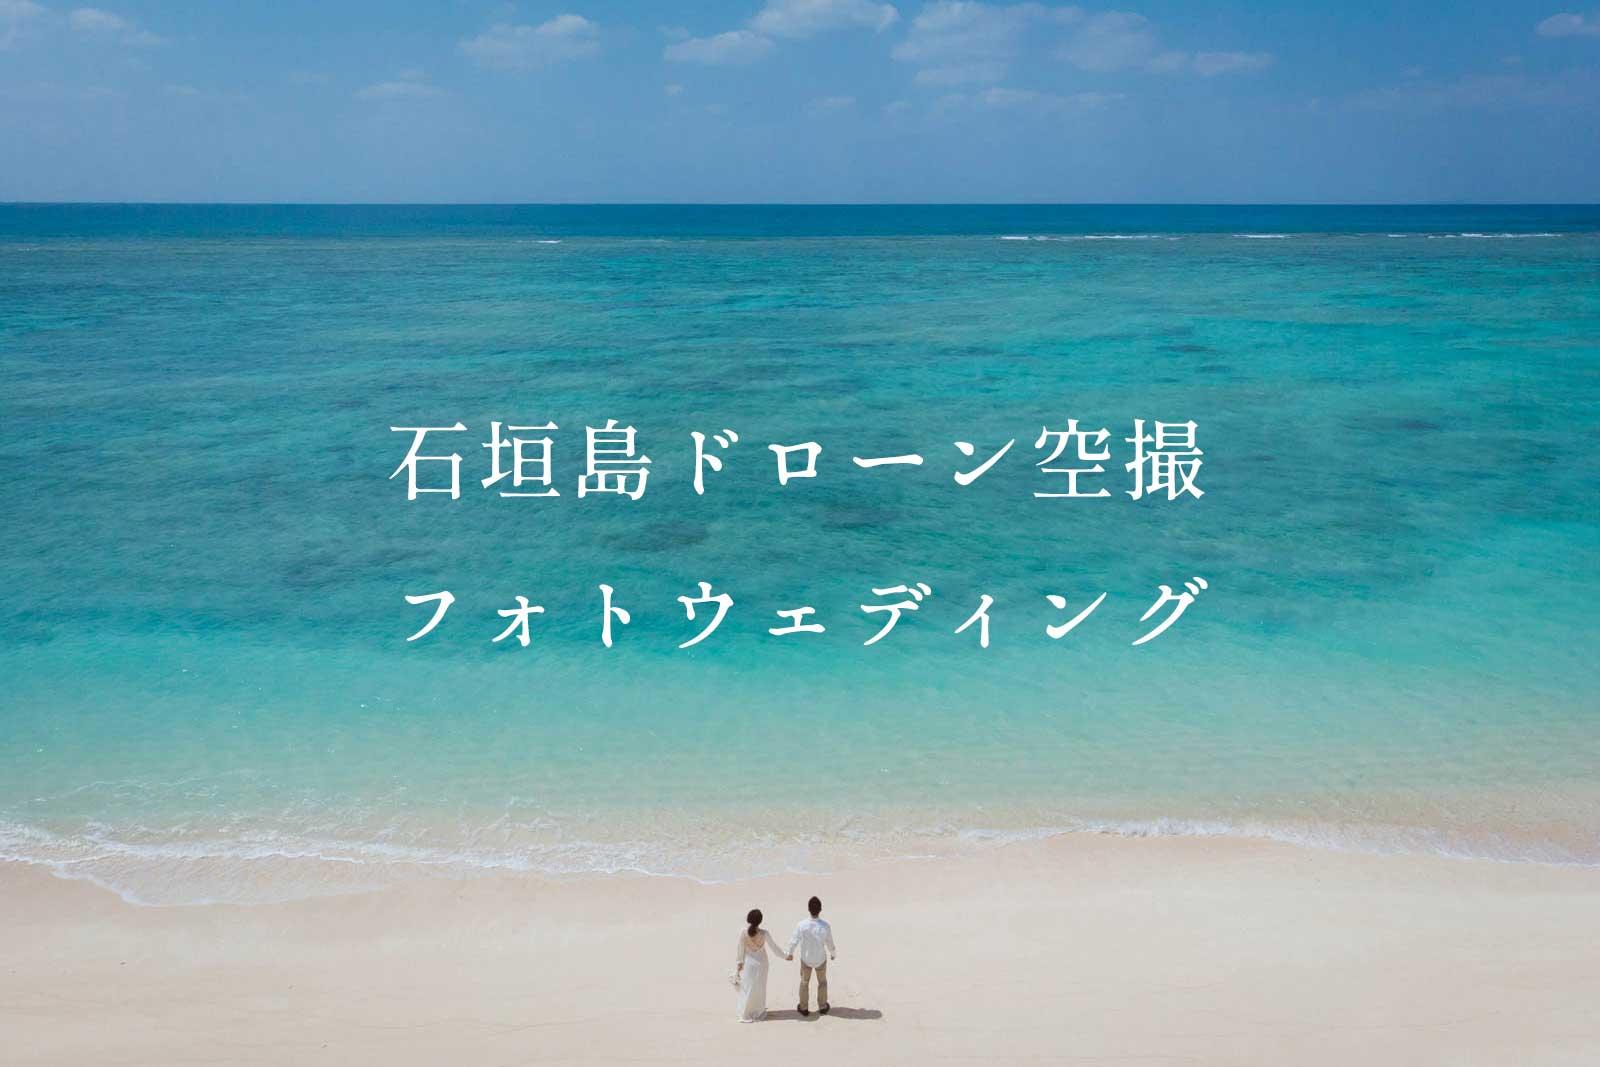 ishigaki-drone-photography